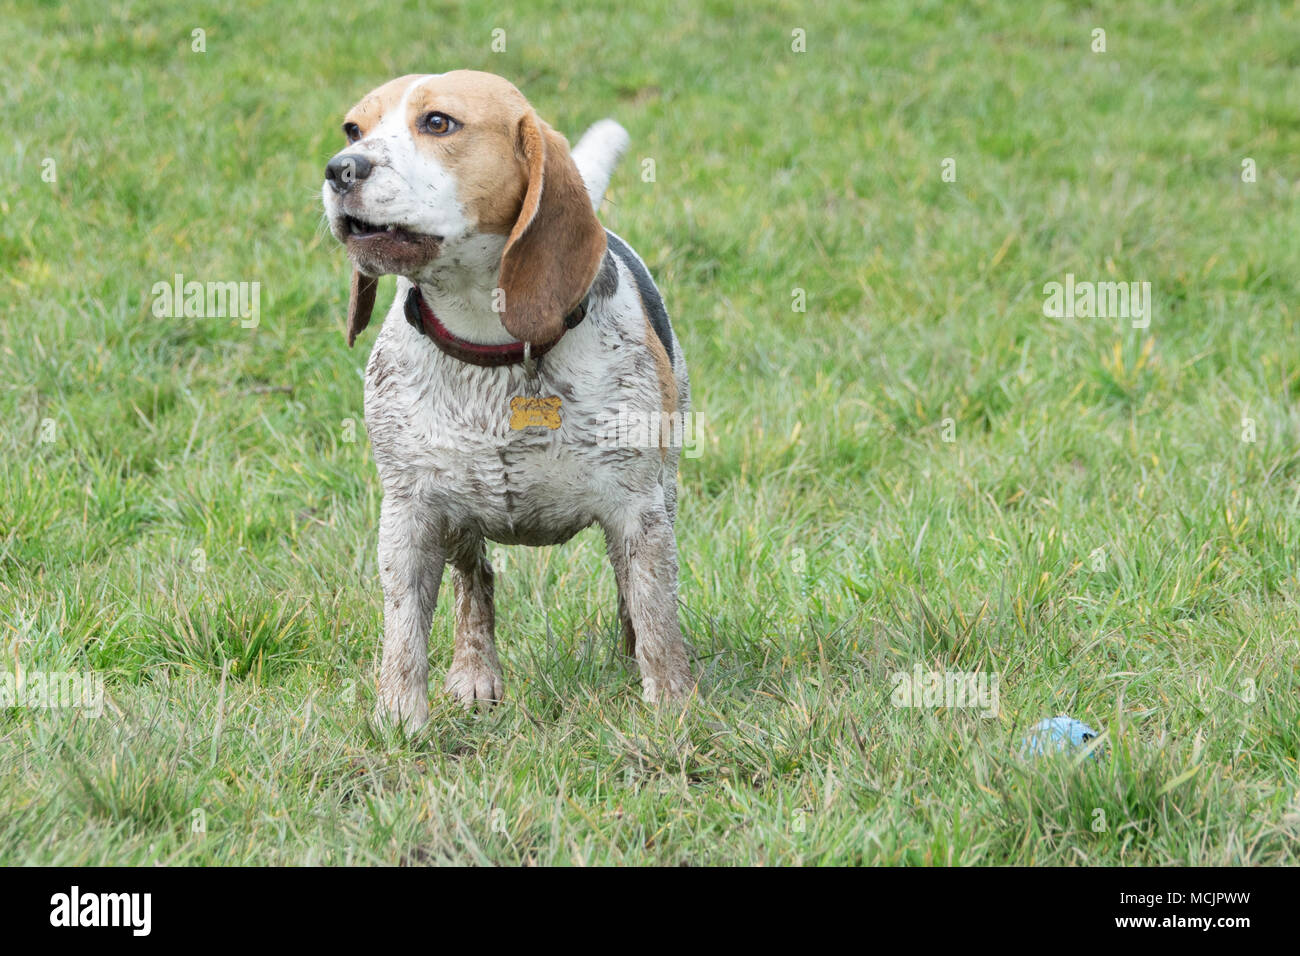 Dog In Rope Stockfotos & Dog In Rope Bilder - Seite 2 - Alamy